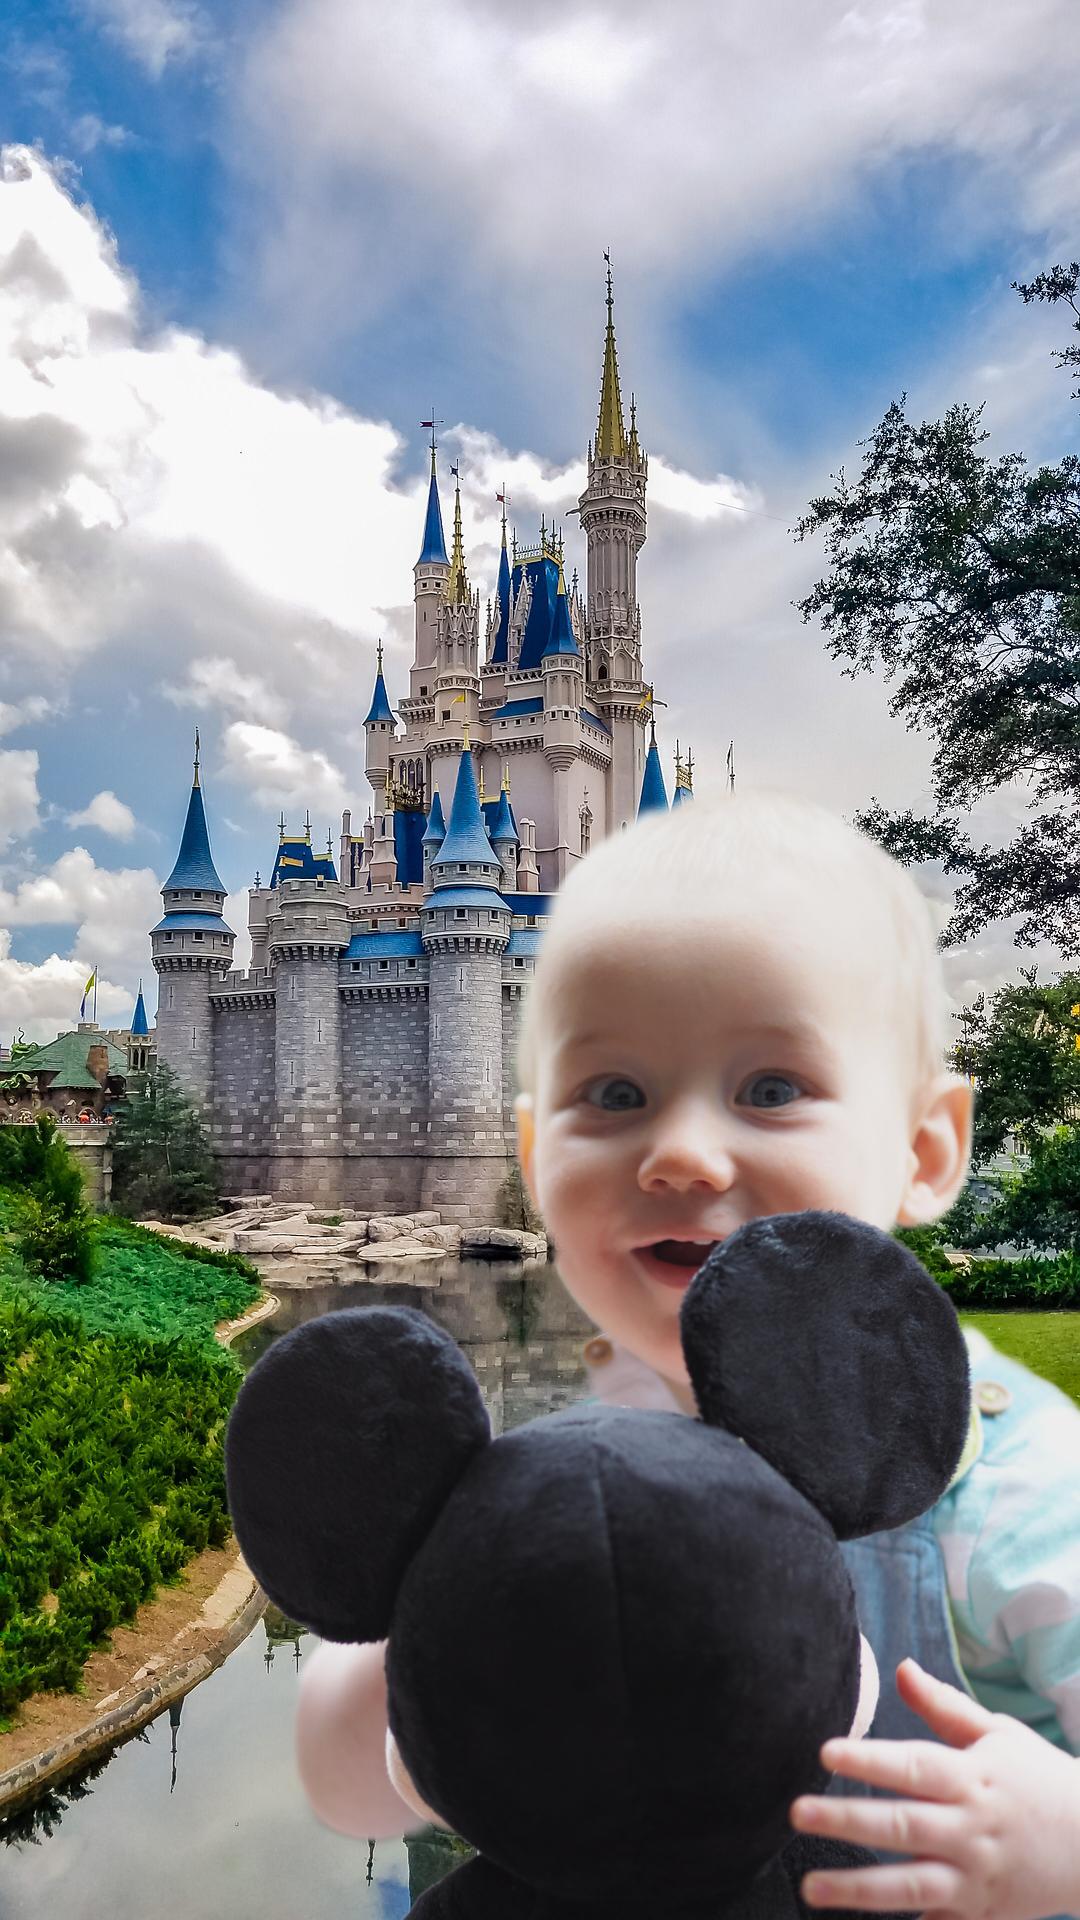 Having Fun with Disney Baby Collection - Disney Magic 3